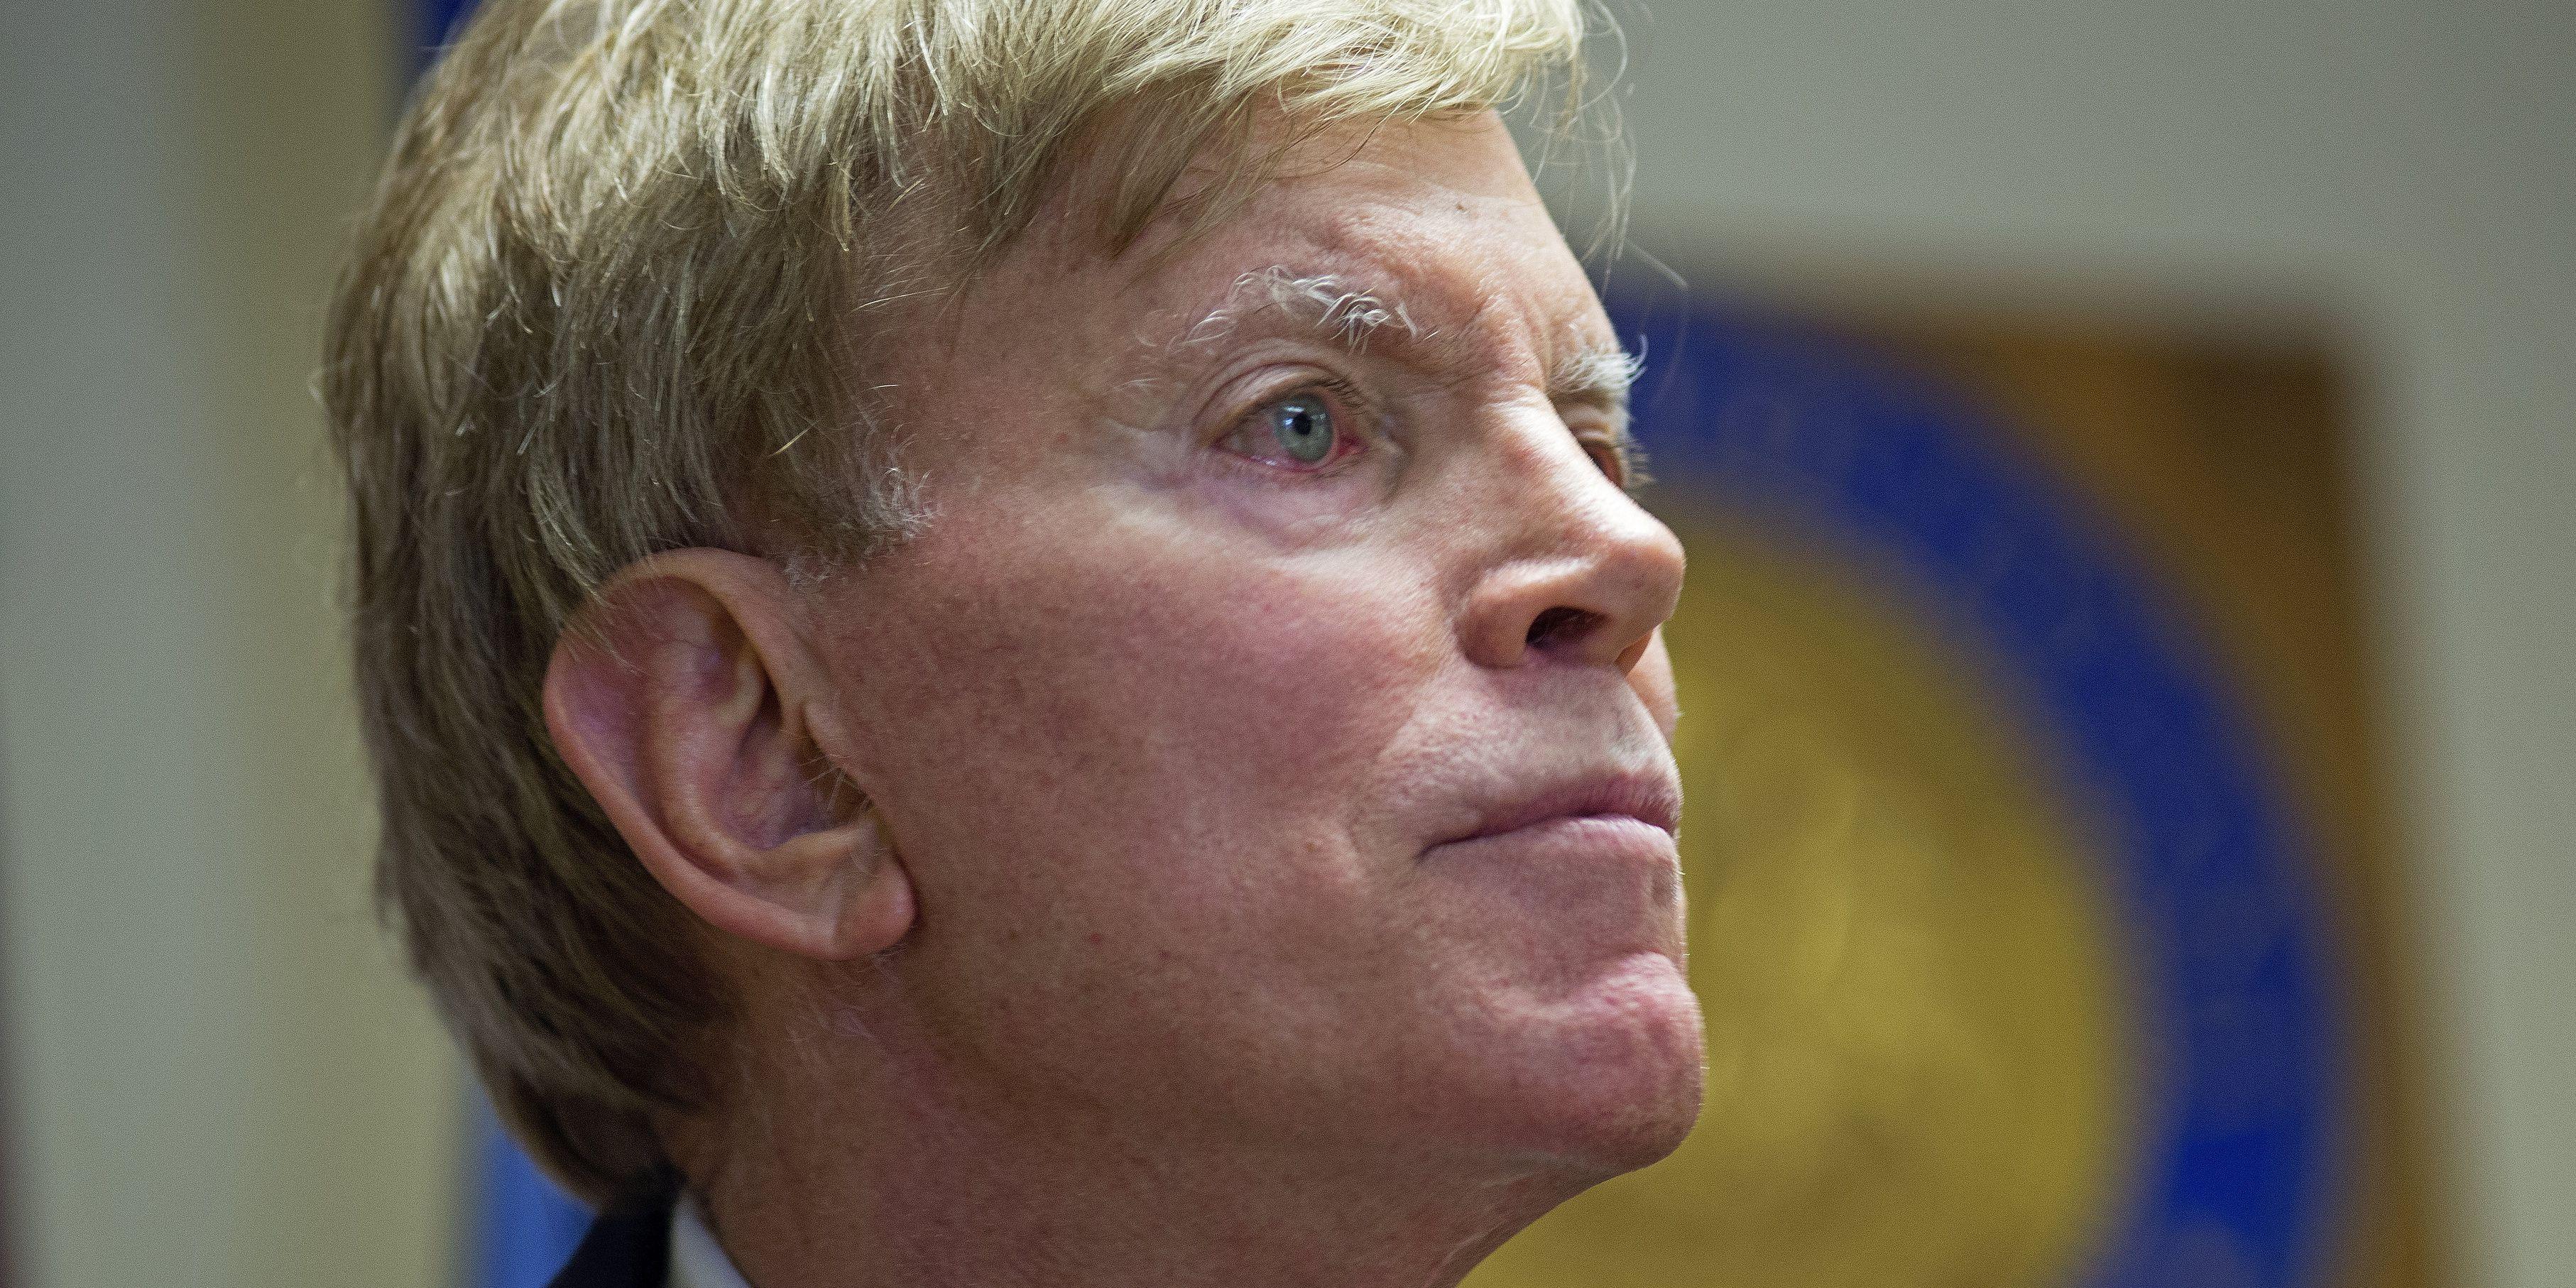 David Duke agrees to pay $5K to man hurt at Virginia rally